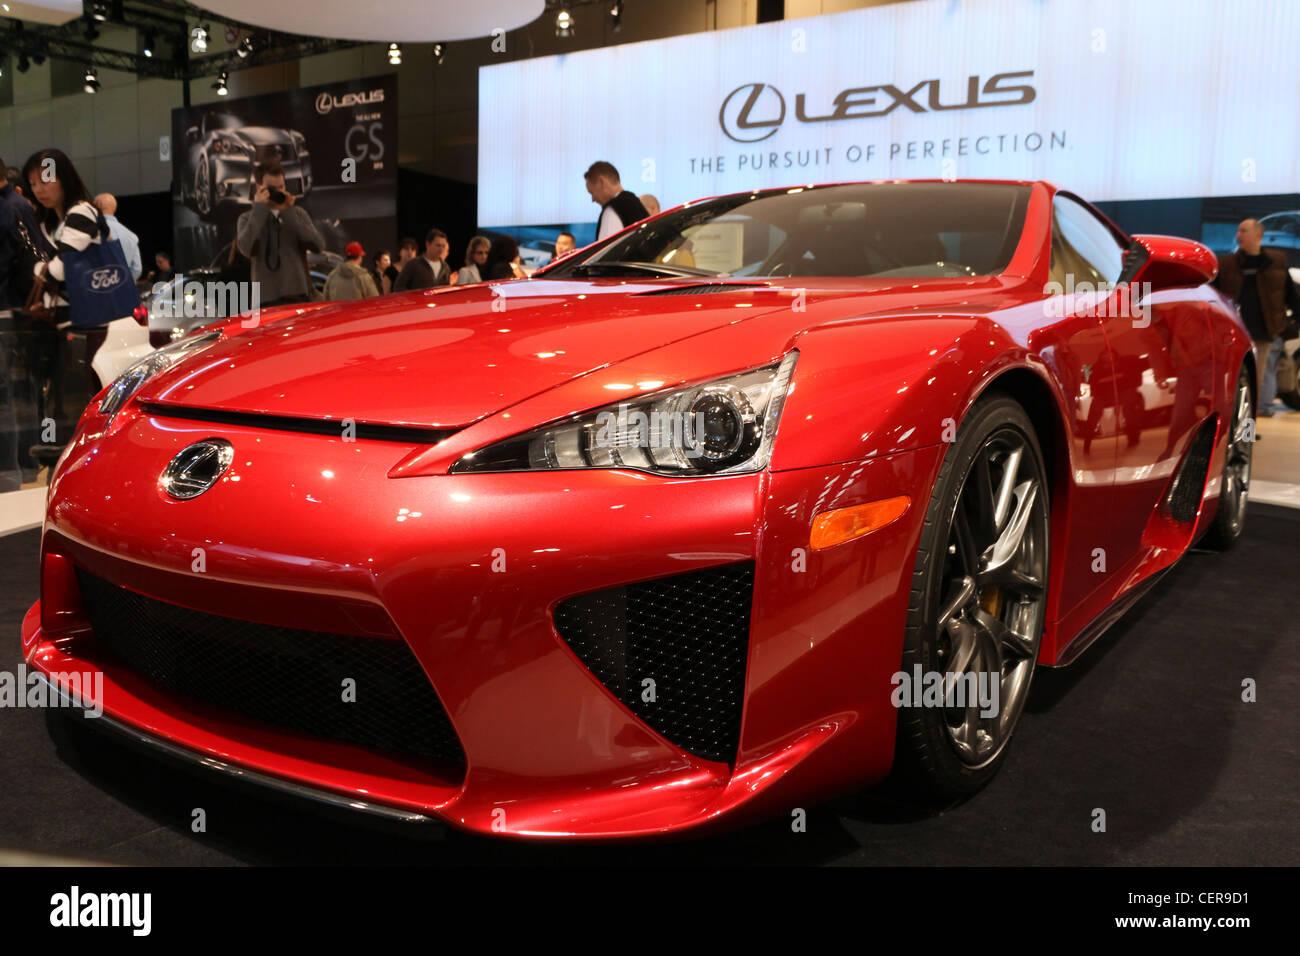 Red Sports Concept Car Lexus Lfa Stock Photo 43538237 Alamy